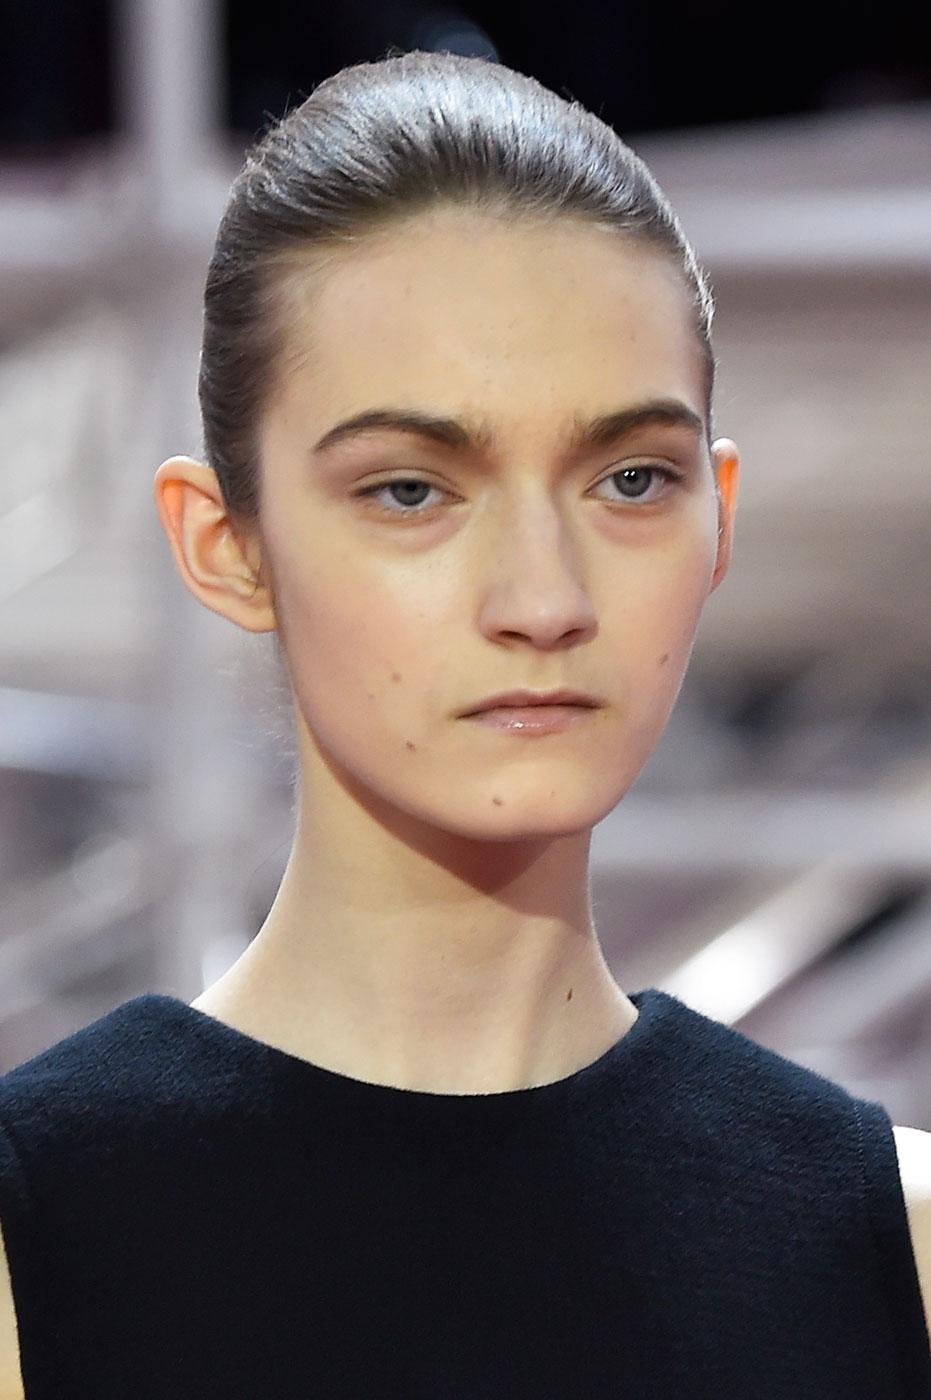 Christian-Dior-fashion-runway-show-close-ups-haute-couture-paris-spring-summer-2015-the-impression-010